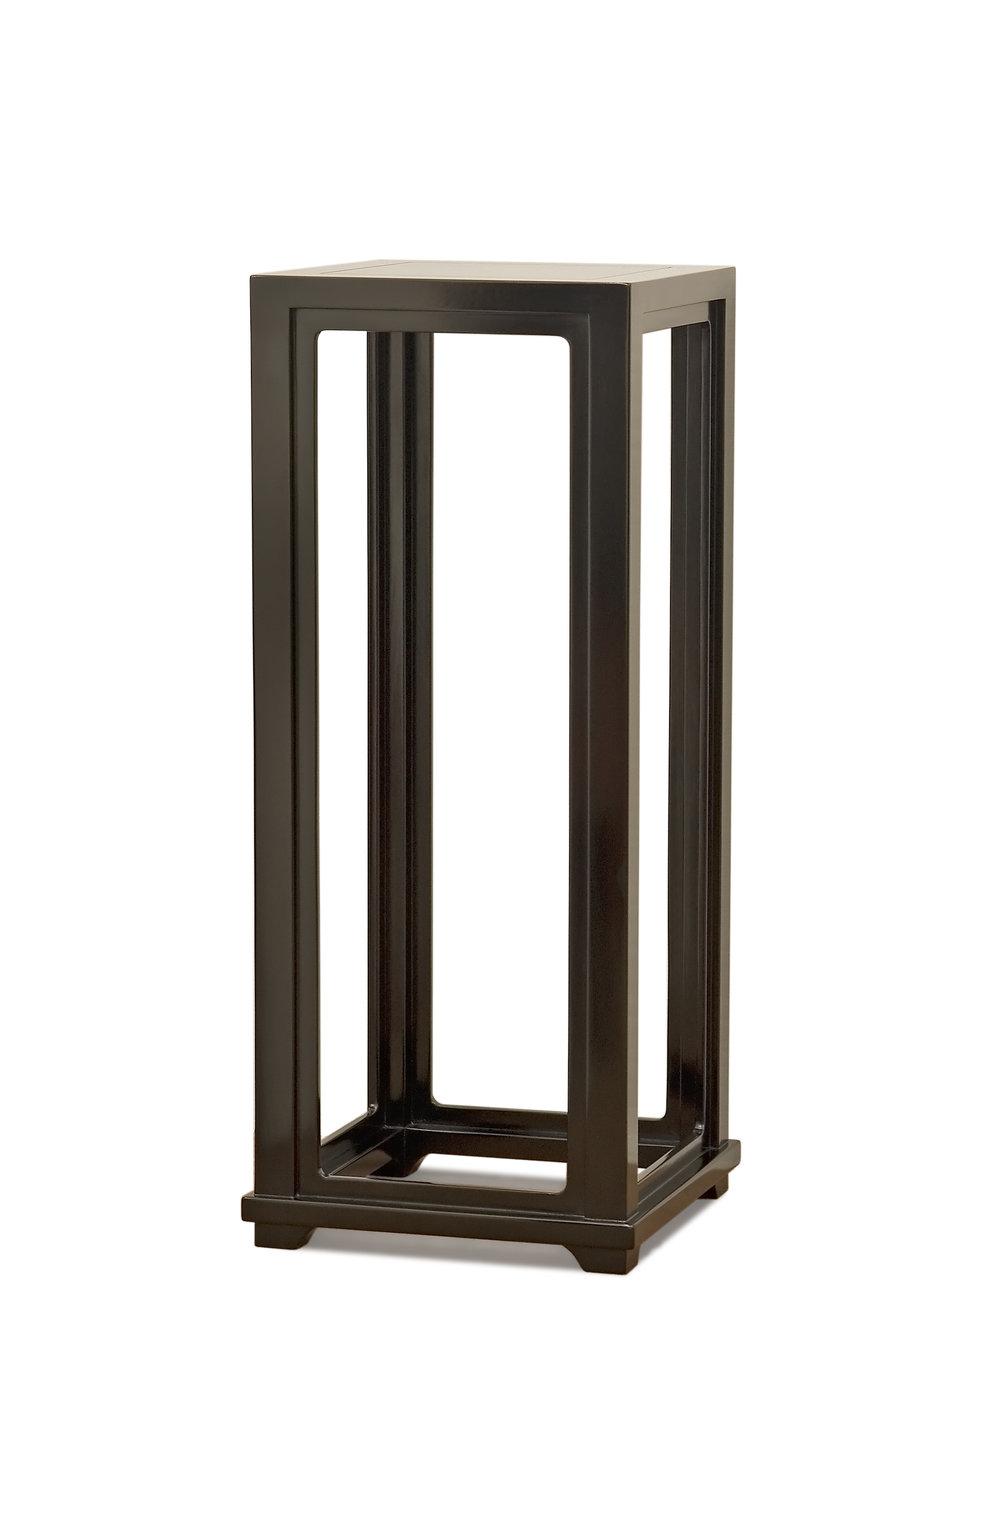 ....Chinese ming style furniture : stand ..中式明式家具 : 花几....